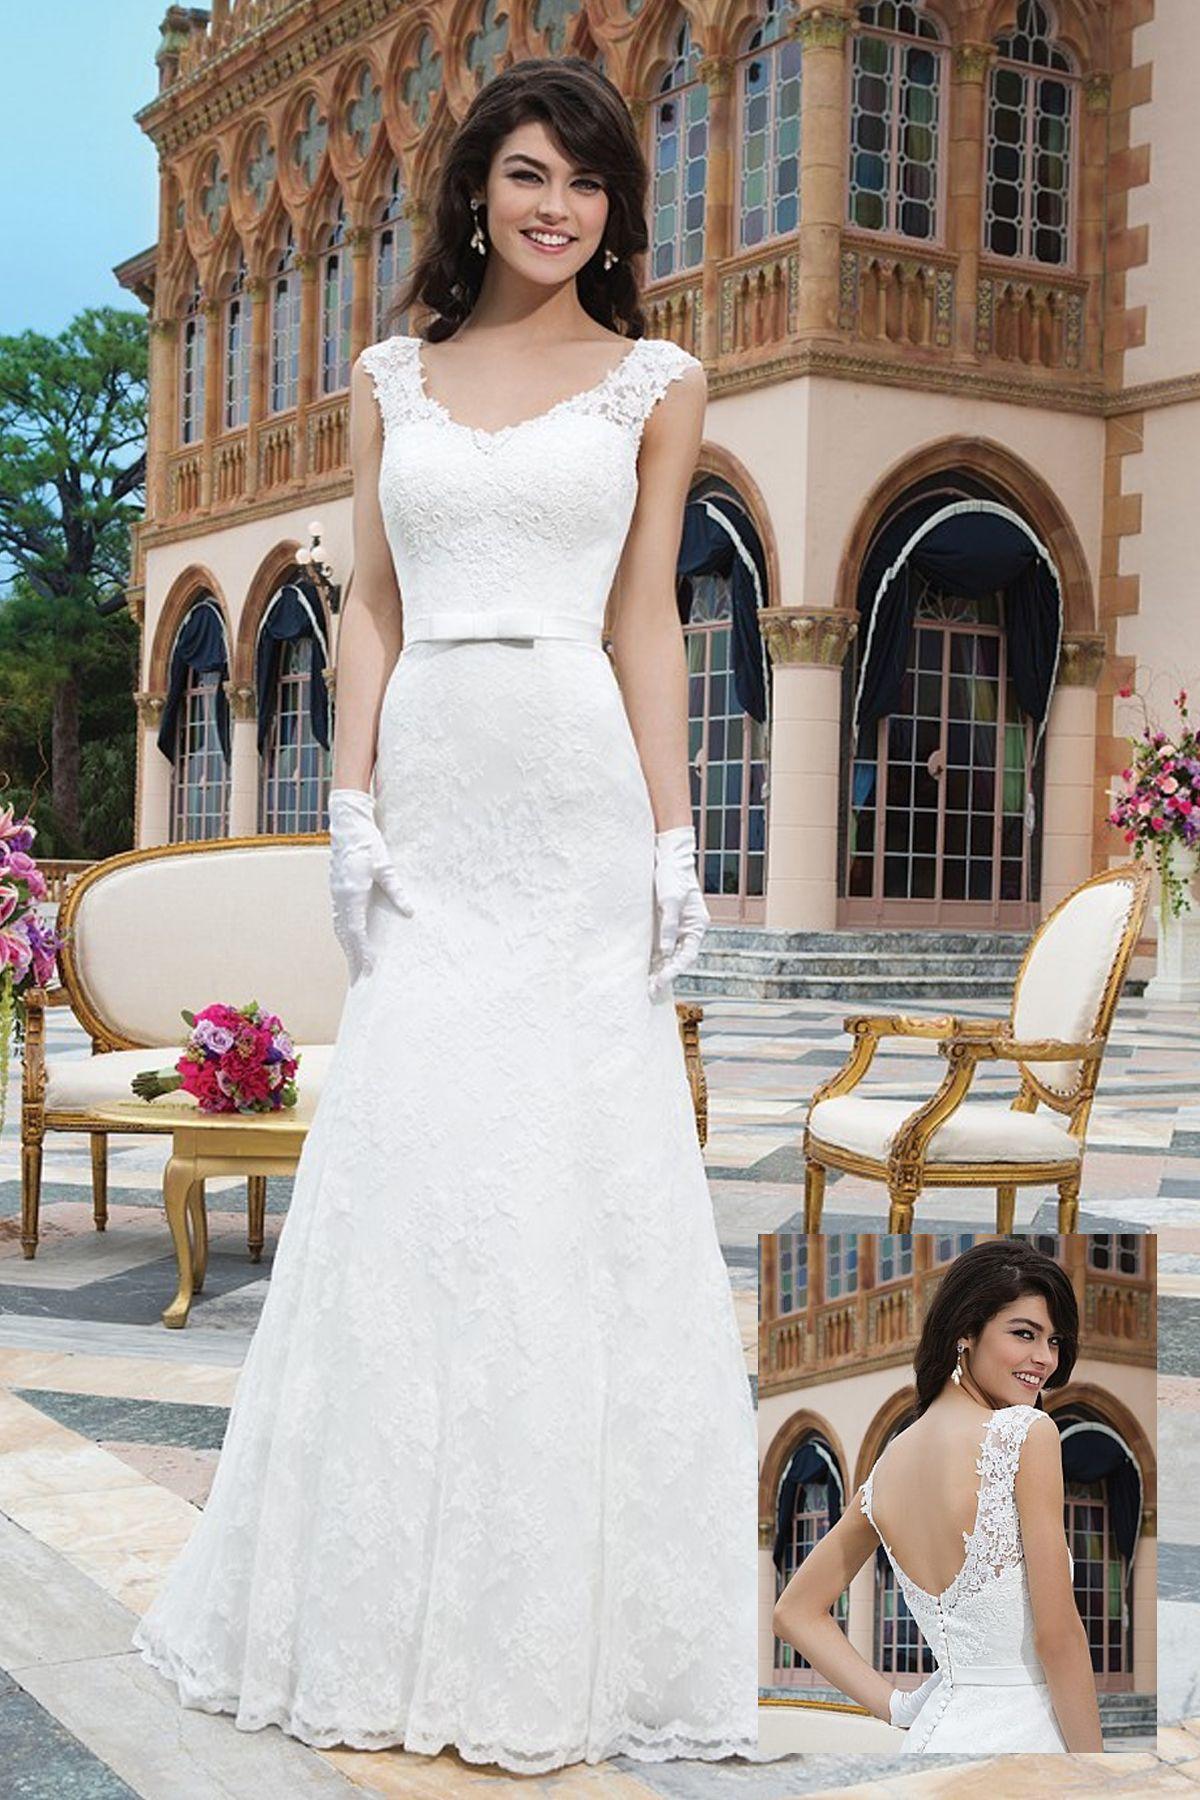 Bridal Collections Spokane Wa Sincerity 3835 Wedding Dresses Lace Top Wedding Gowns Sincerity Bridal Wedding Dresses